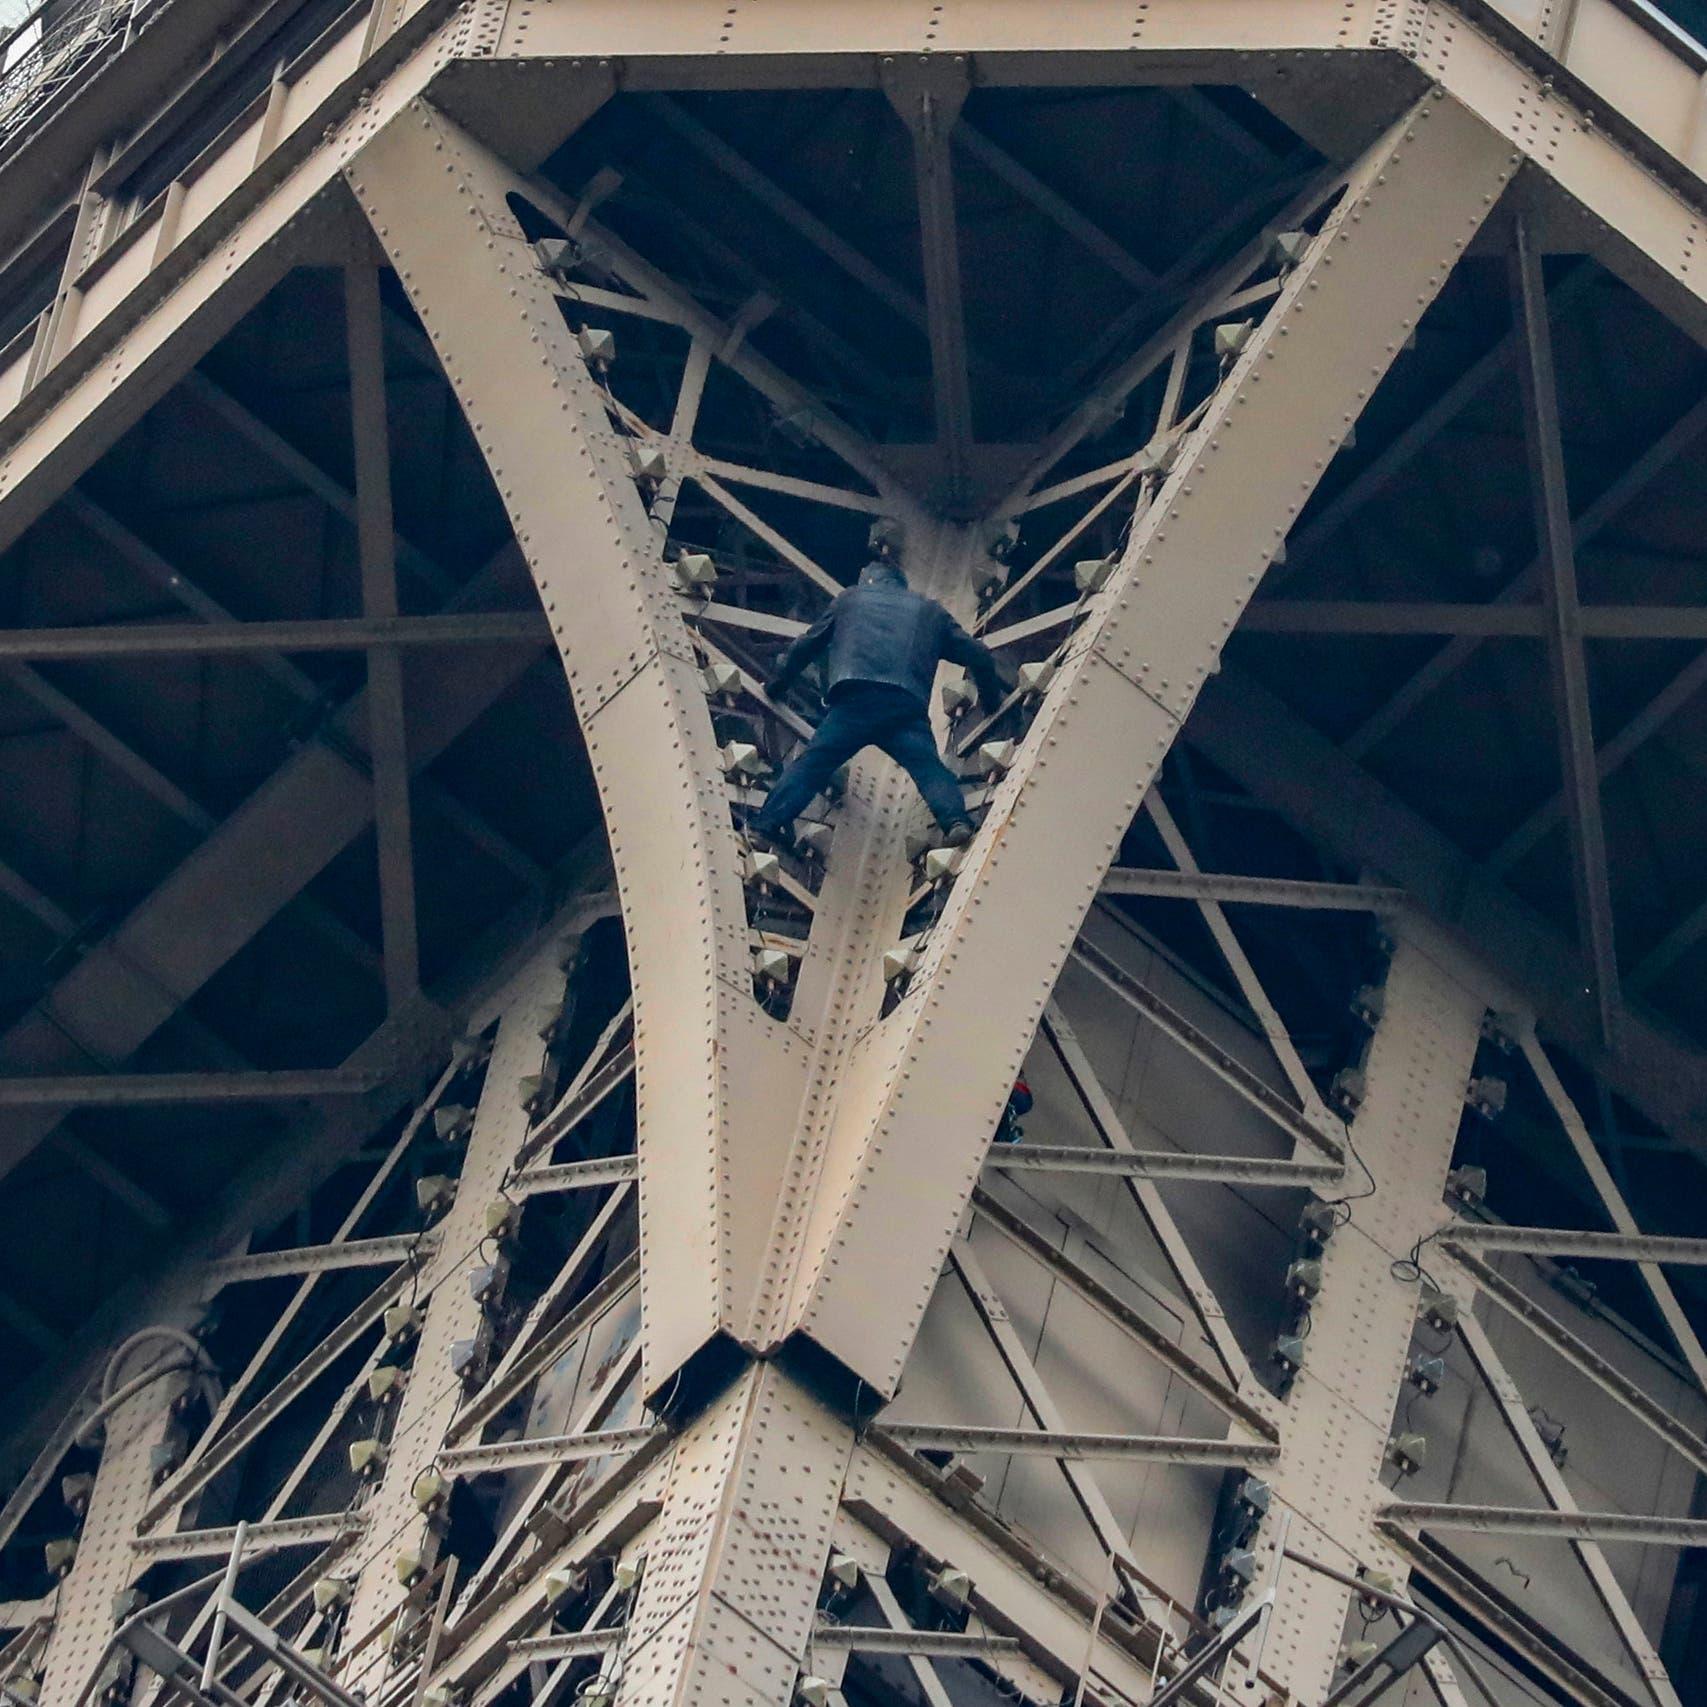 تسلق برج إيفل.. وبقي متدلياً 6 ساعات